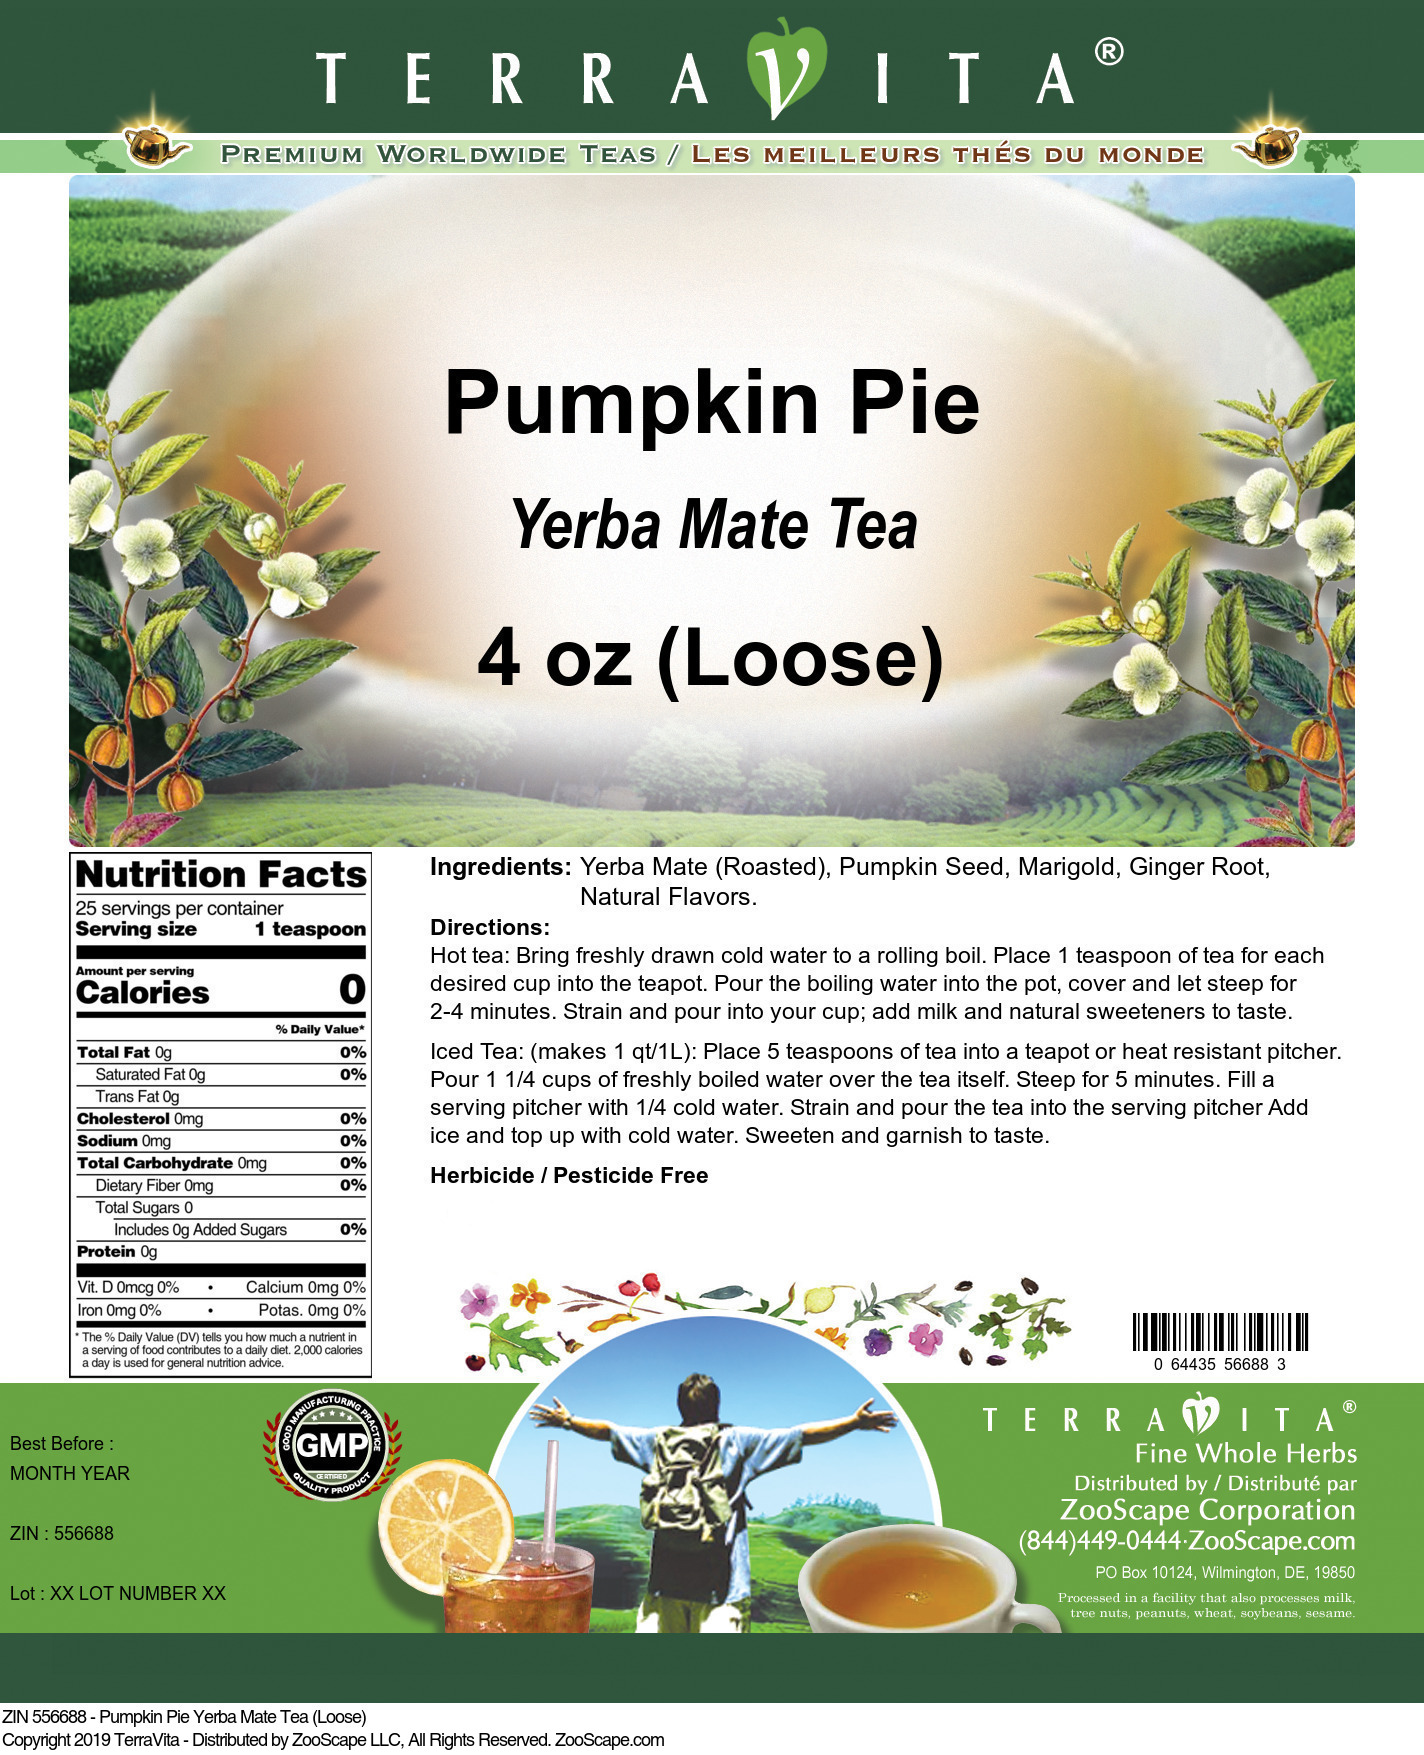 Pumpkin Pie Yerba Mate Tea (Loose)